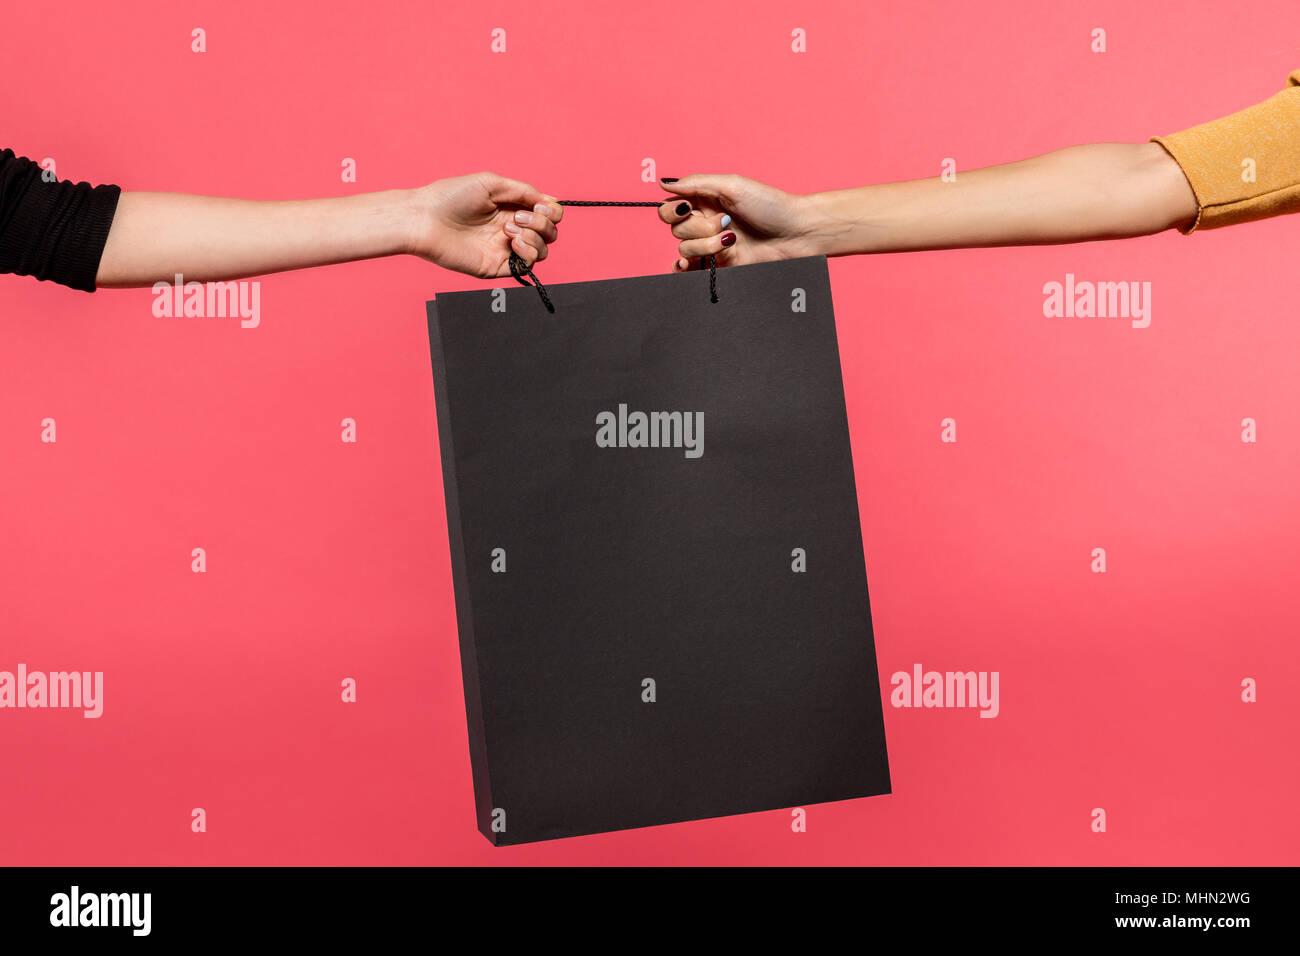 women pulling shopping bag - Stock Image